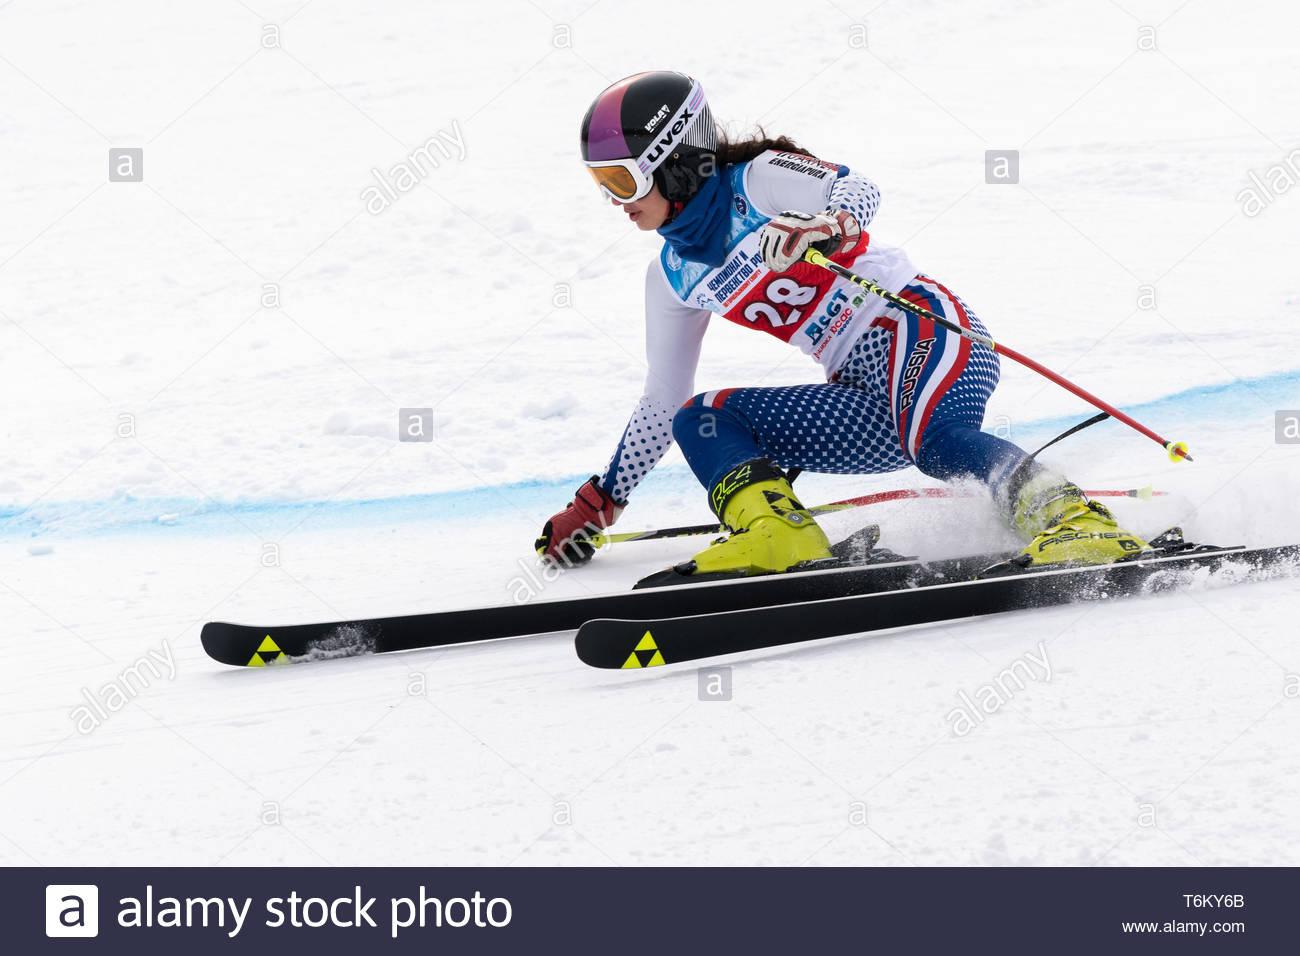 KAMCHATKA PENINSULA, RUSSIA - APR 2, 2019: Mountain skier Anna Vakhnina (Krasnoyarsk Region) skiing down mount. Russian Women's Alpine Skiing Cup Inte - Stock Image